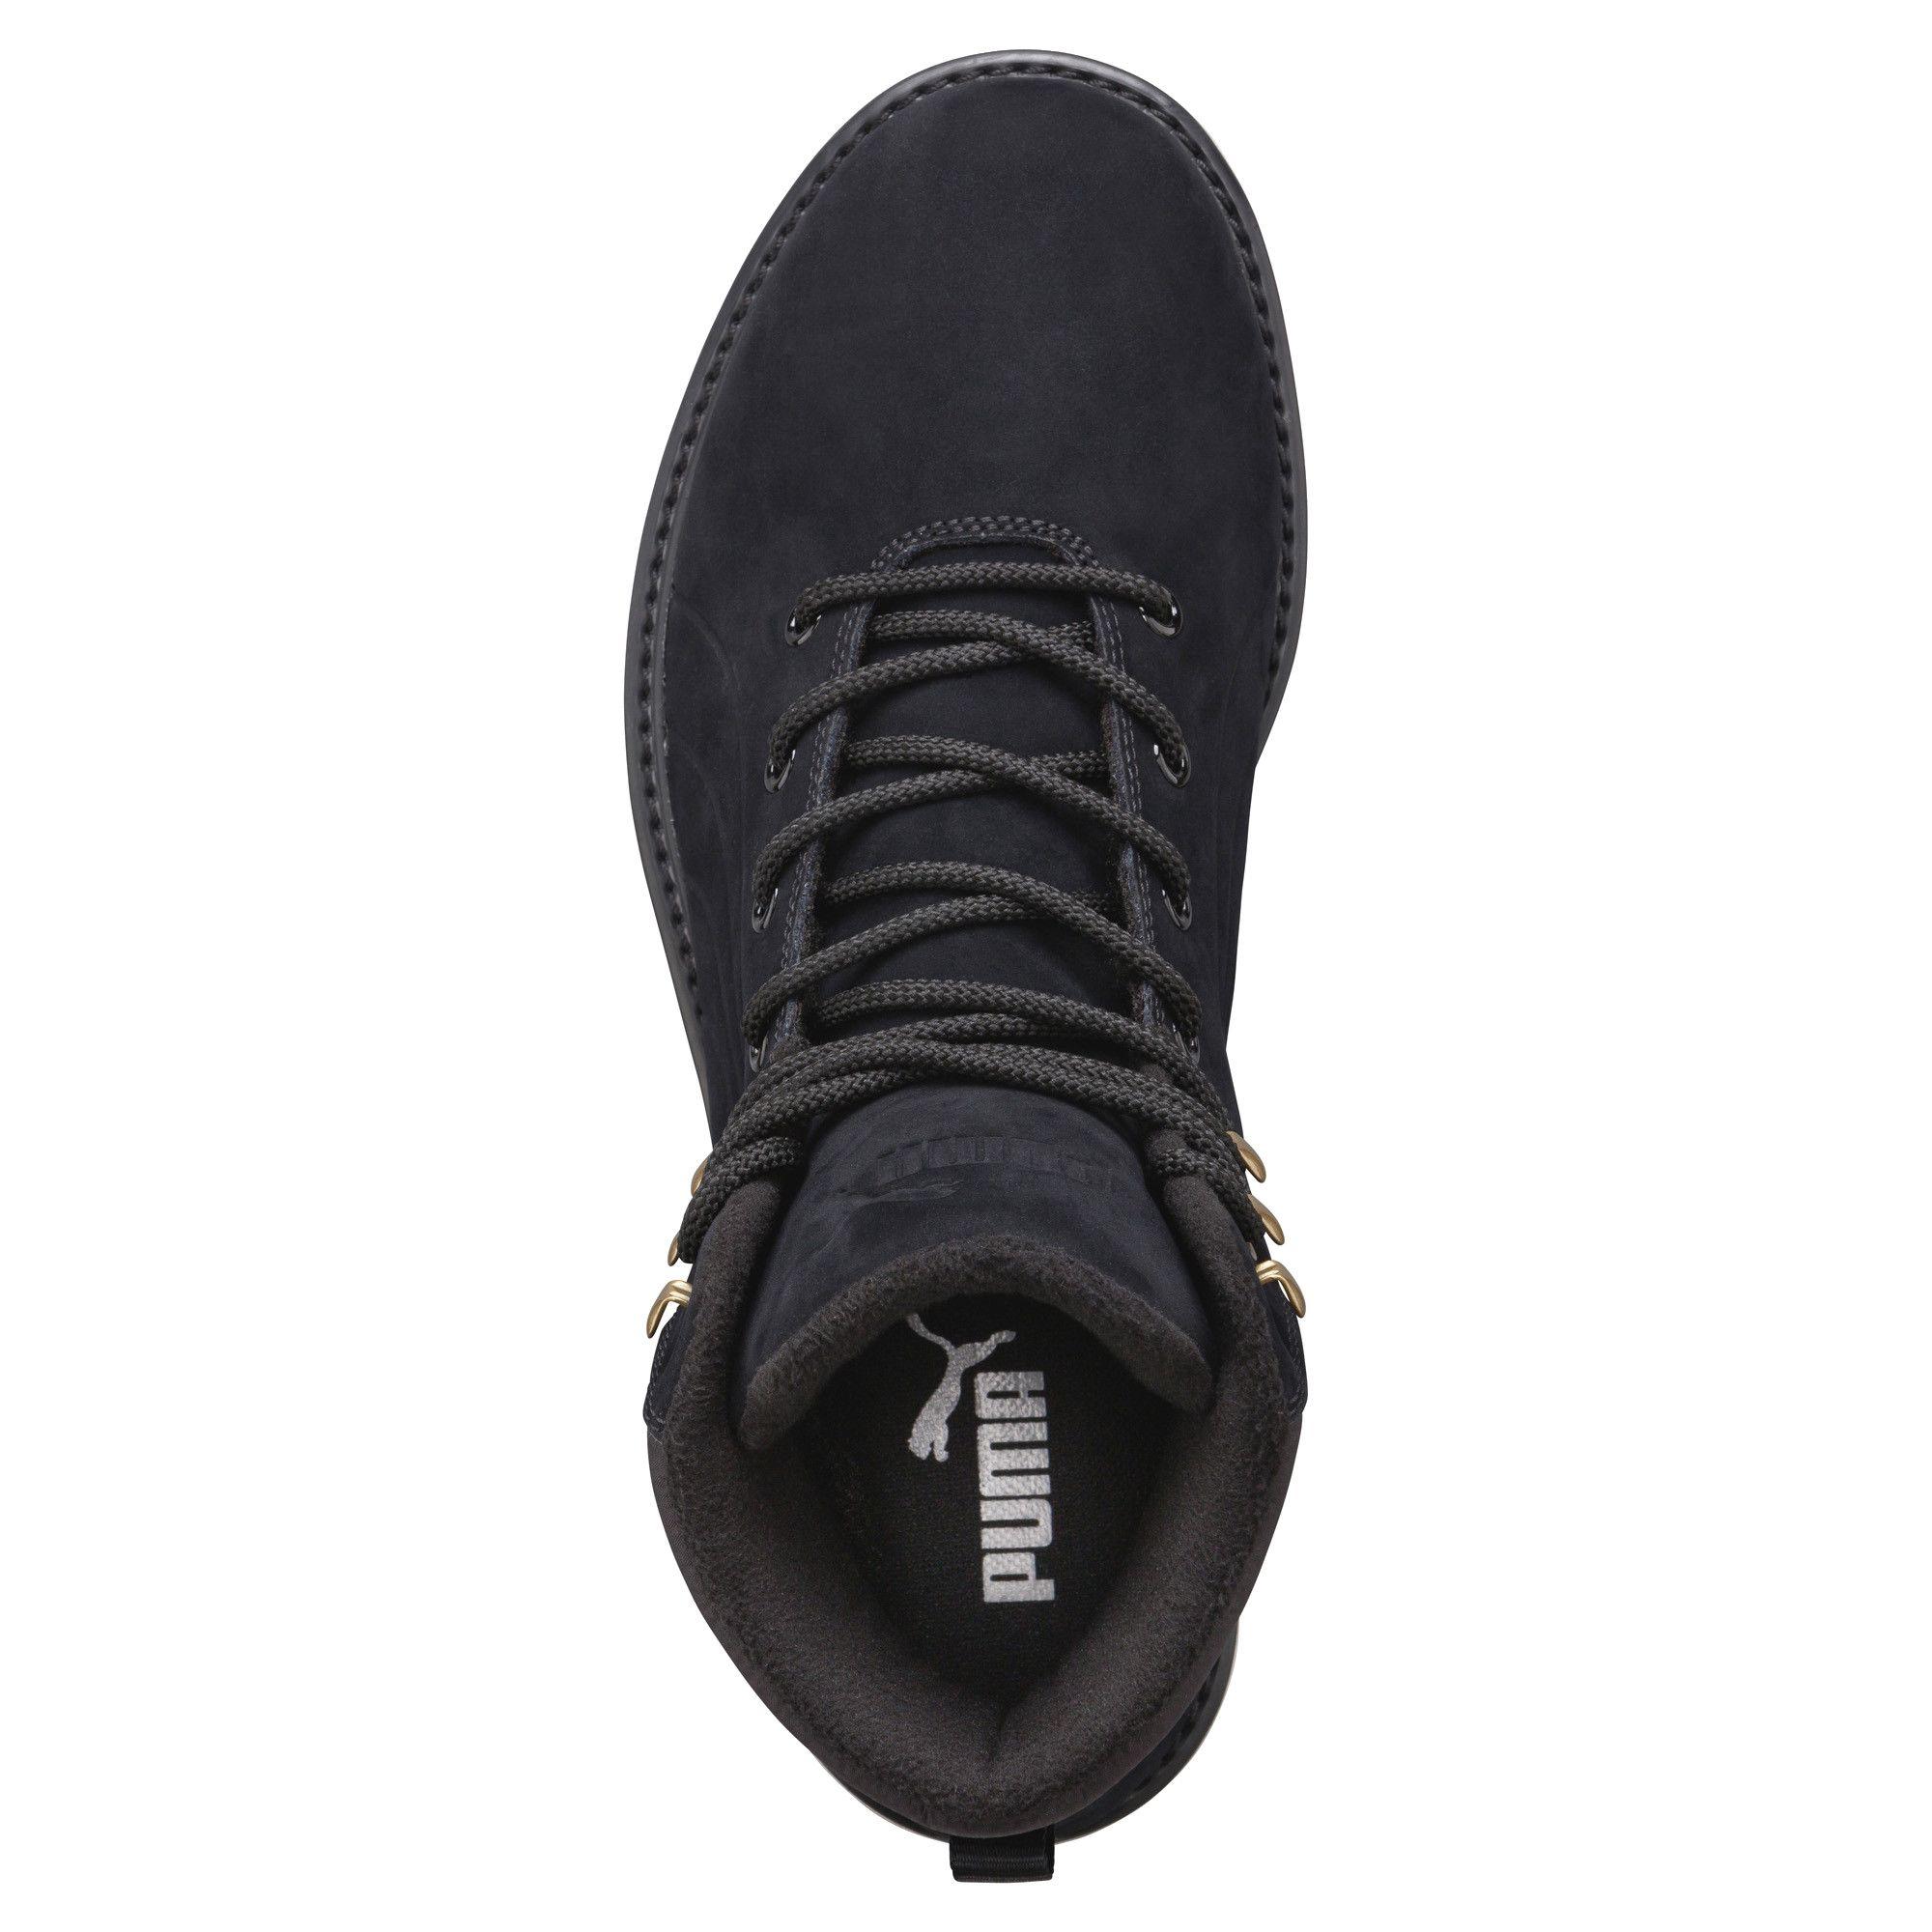 2a1c3f04ab4 PUMA Desierto Fun Winter Boots Basics High Boot Unisex New